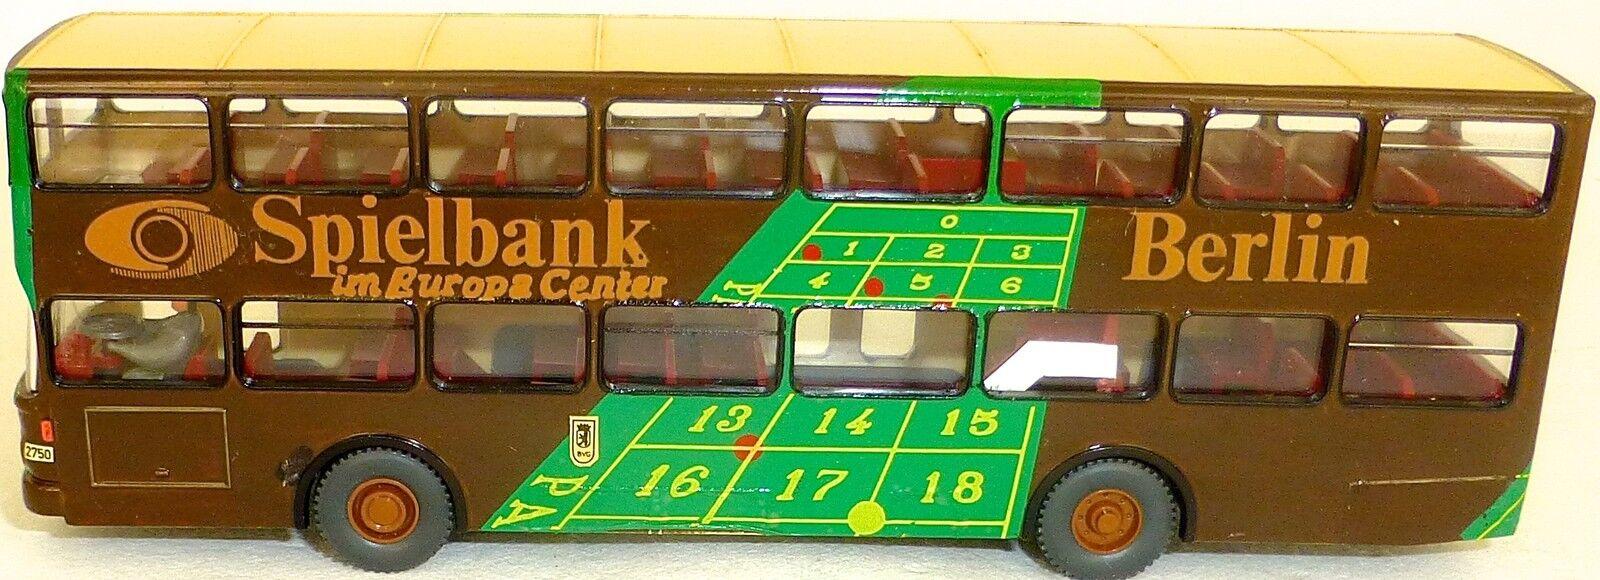 CASINO Berlin 99e 99e 99e werbebus on SD 200 gesupert de WIKING BUS h0 1:87 be43 å | Outlet Online Store  897b89